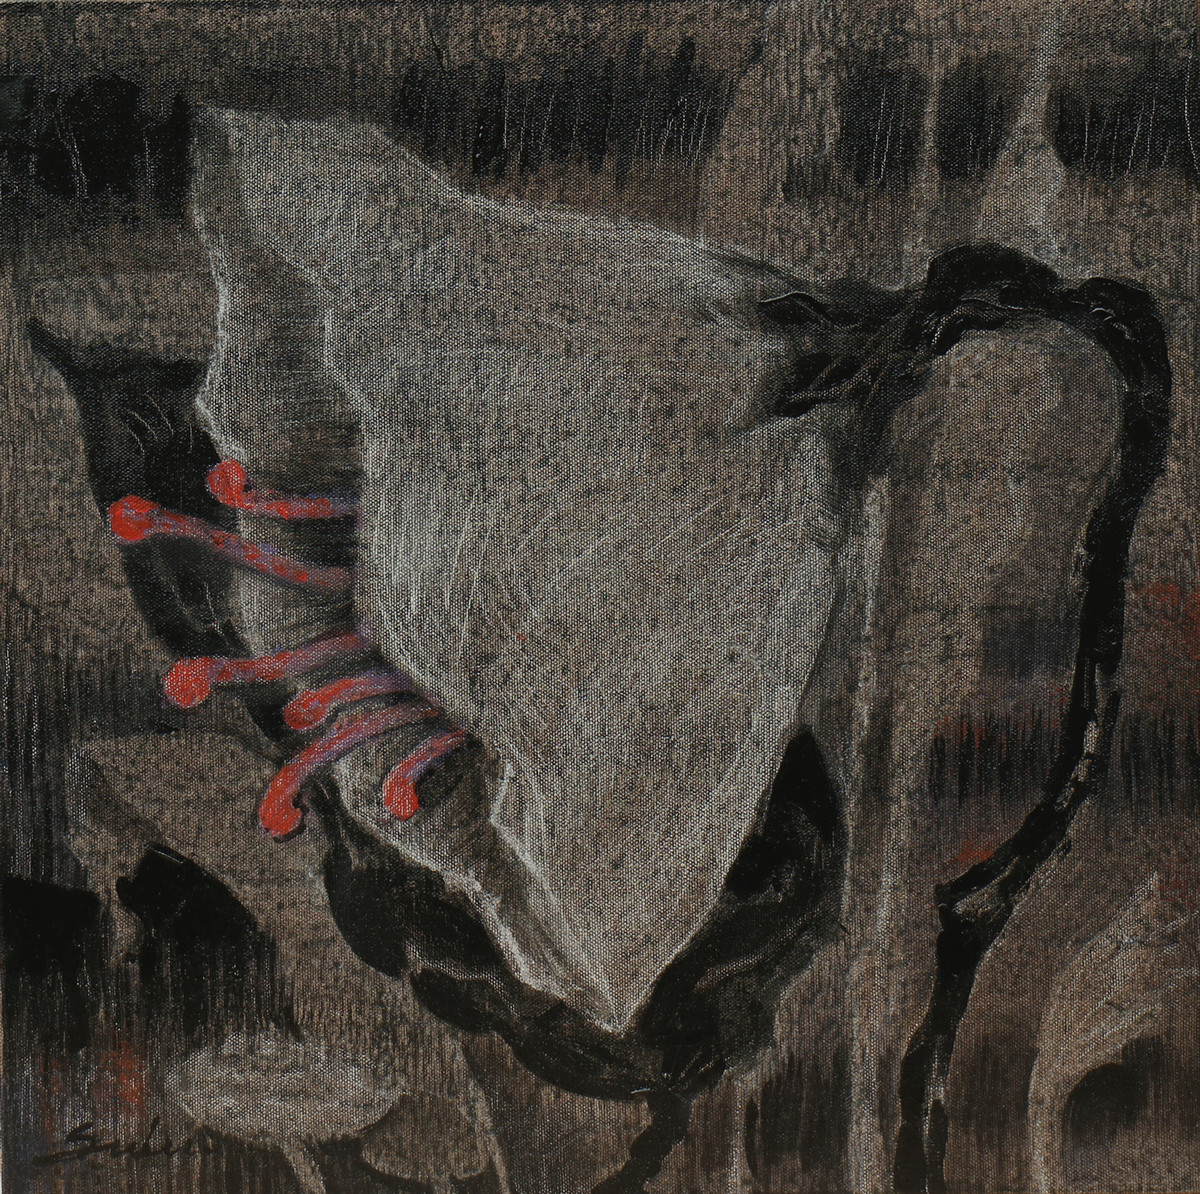 Blossom 1 by Sulakshana Dharmadhikari, Expressionism Painting, Acrylic on Canvas, Gray color